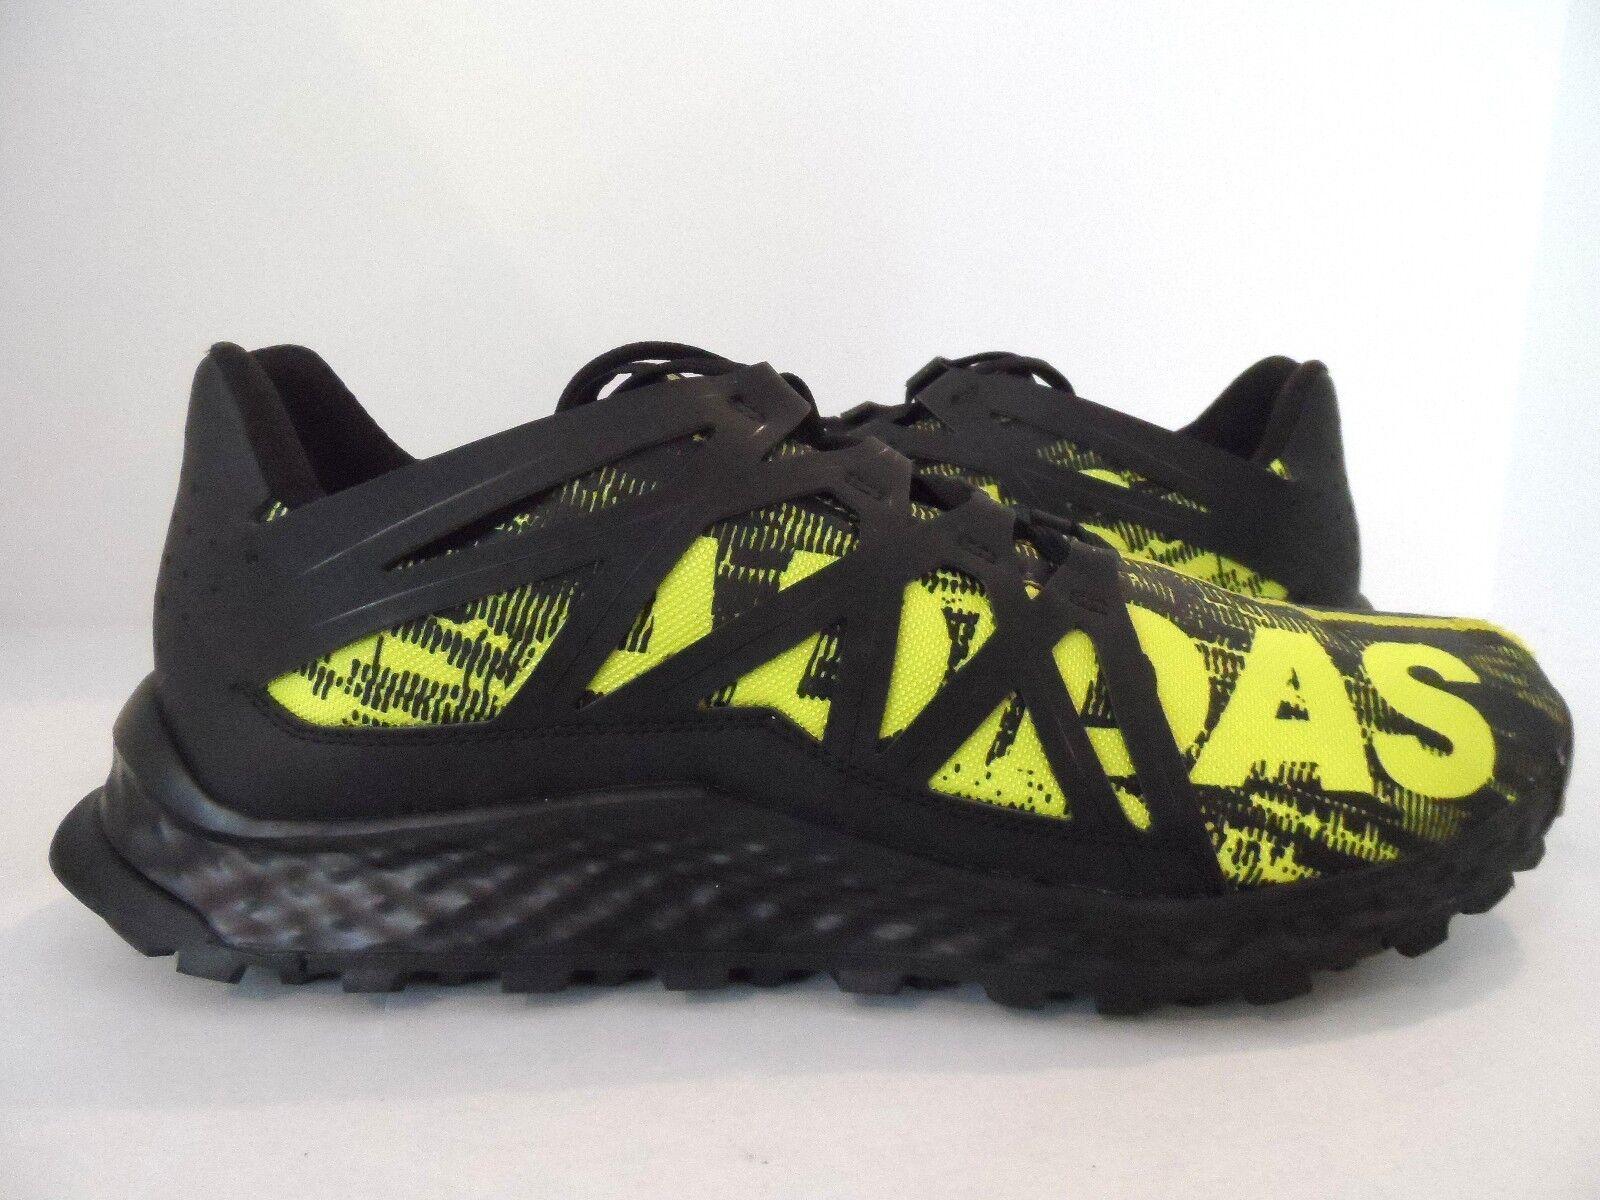 adidas Size Men's Vigor Bounce Trail Runner Black/Shock Slime/Black Size adidas 12.5 abc551